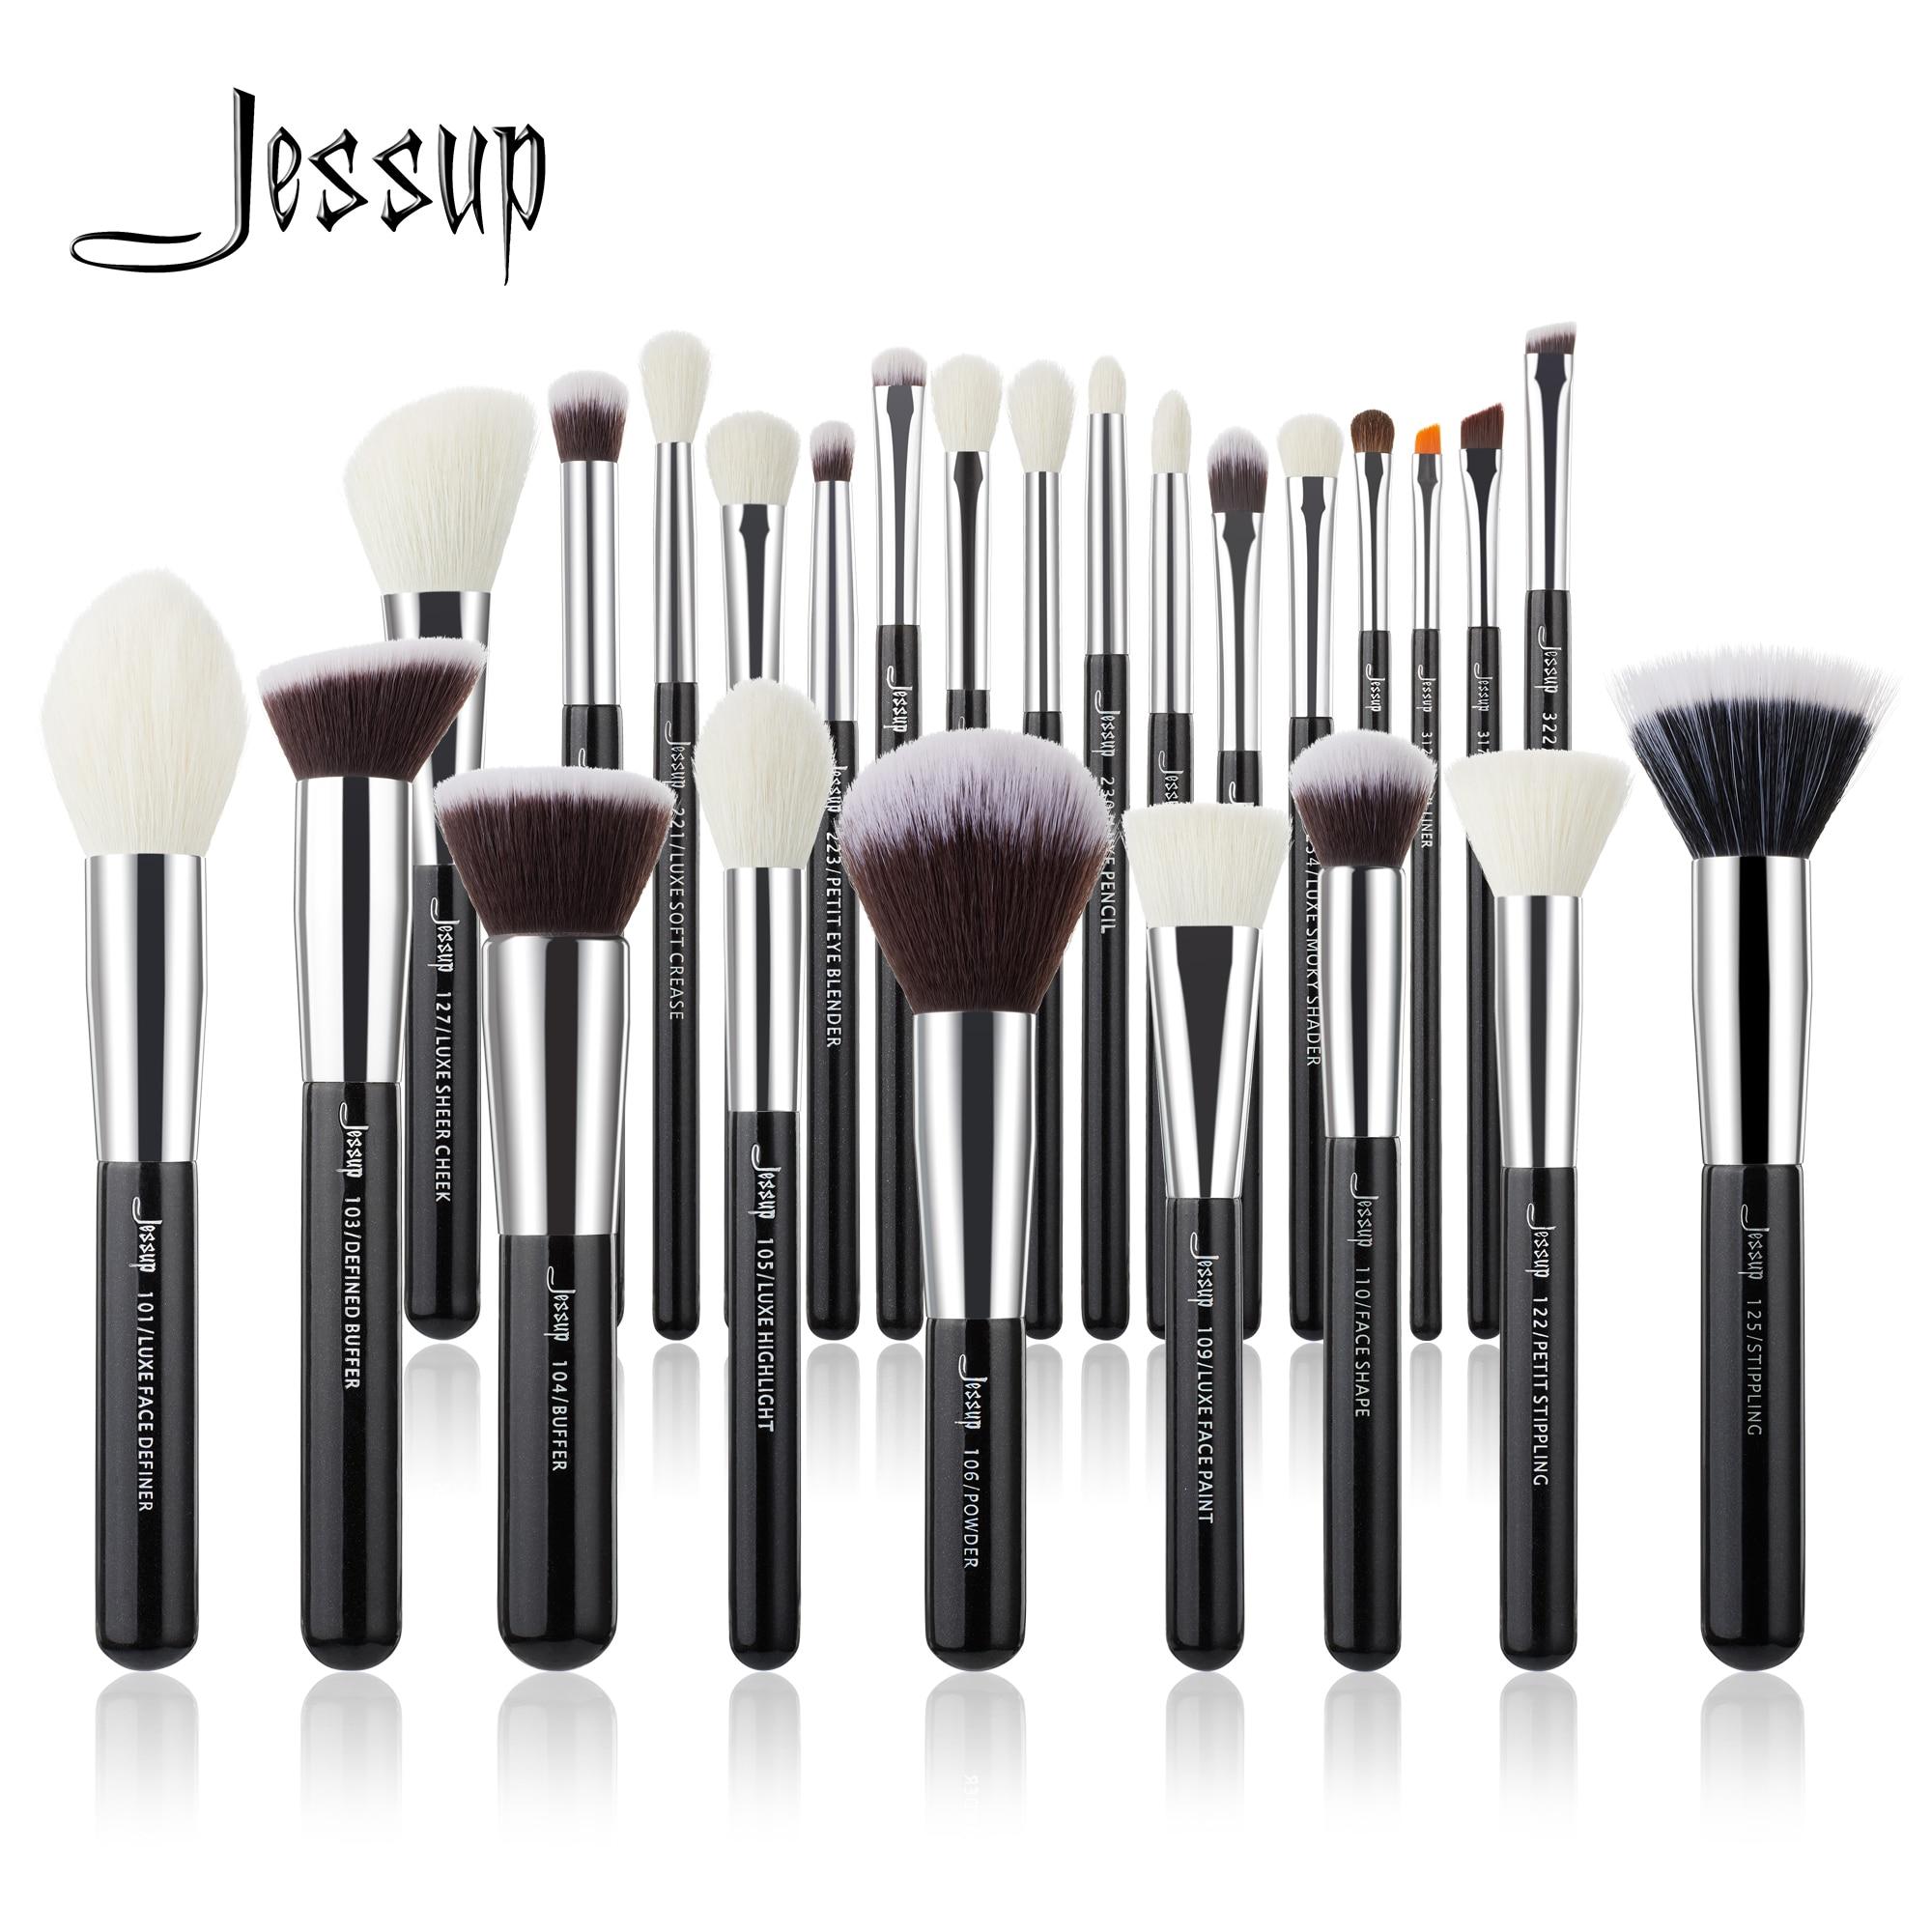 Jessup Makeup brushes set Black/Silver Professional with Natural Hair Foundation Powder Eyeshadow Make up Brush Blush 6pcs 25pcs Eye Shadow Applicator  - AliExpress